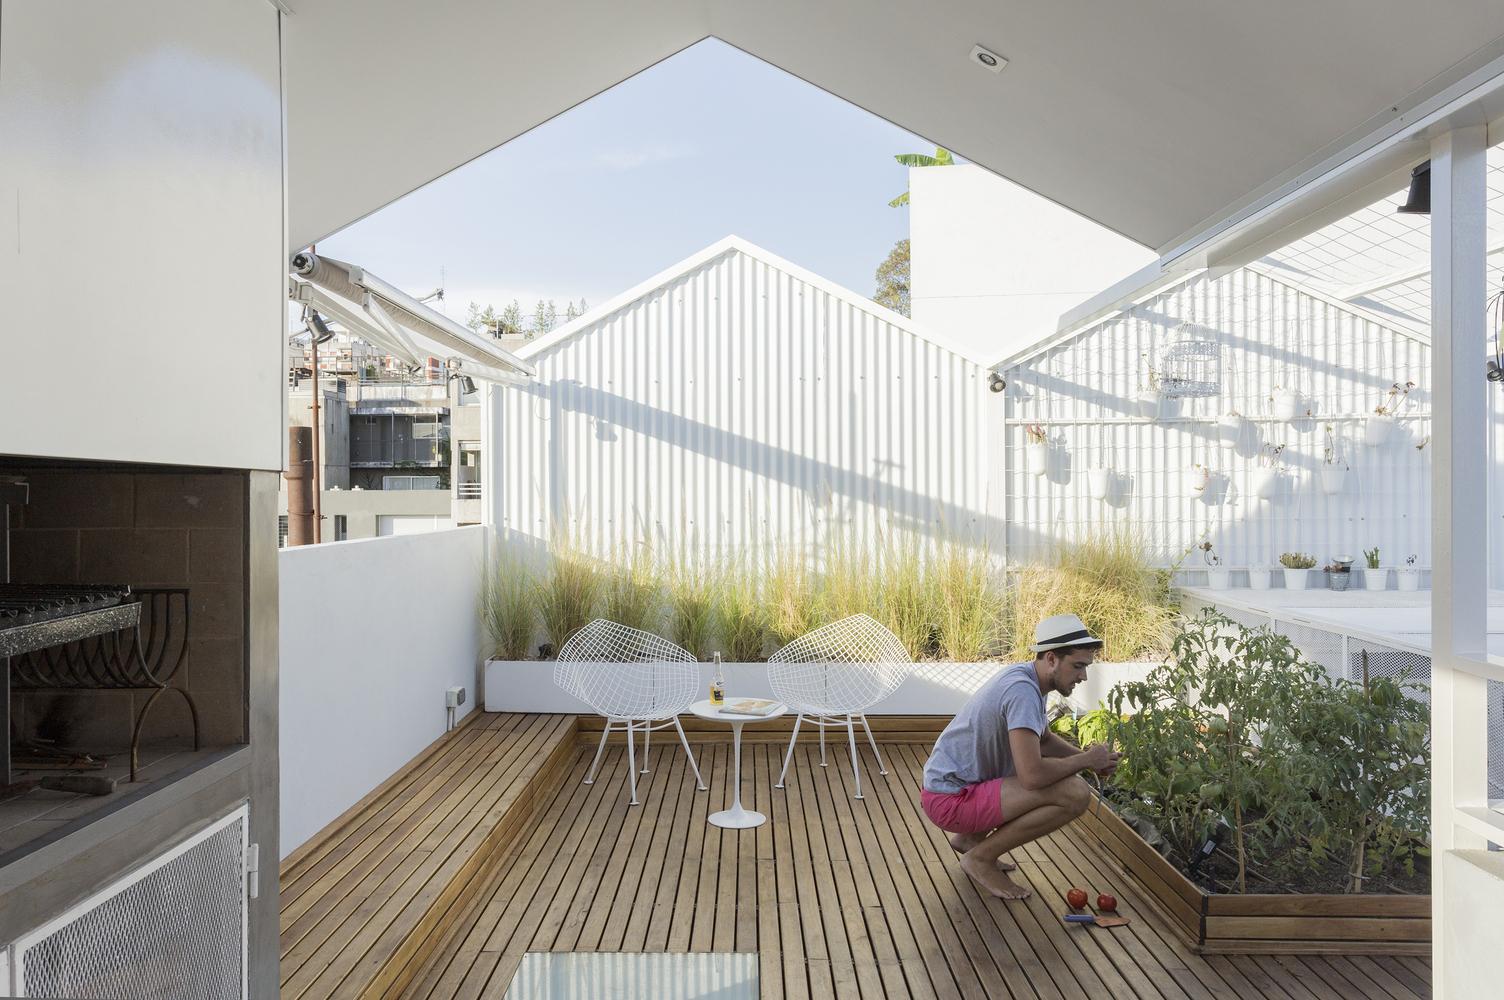 Stylish Raised Garden Ideas for Spring